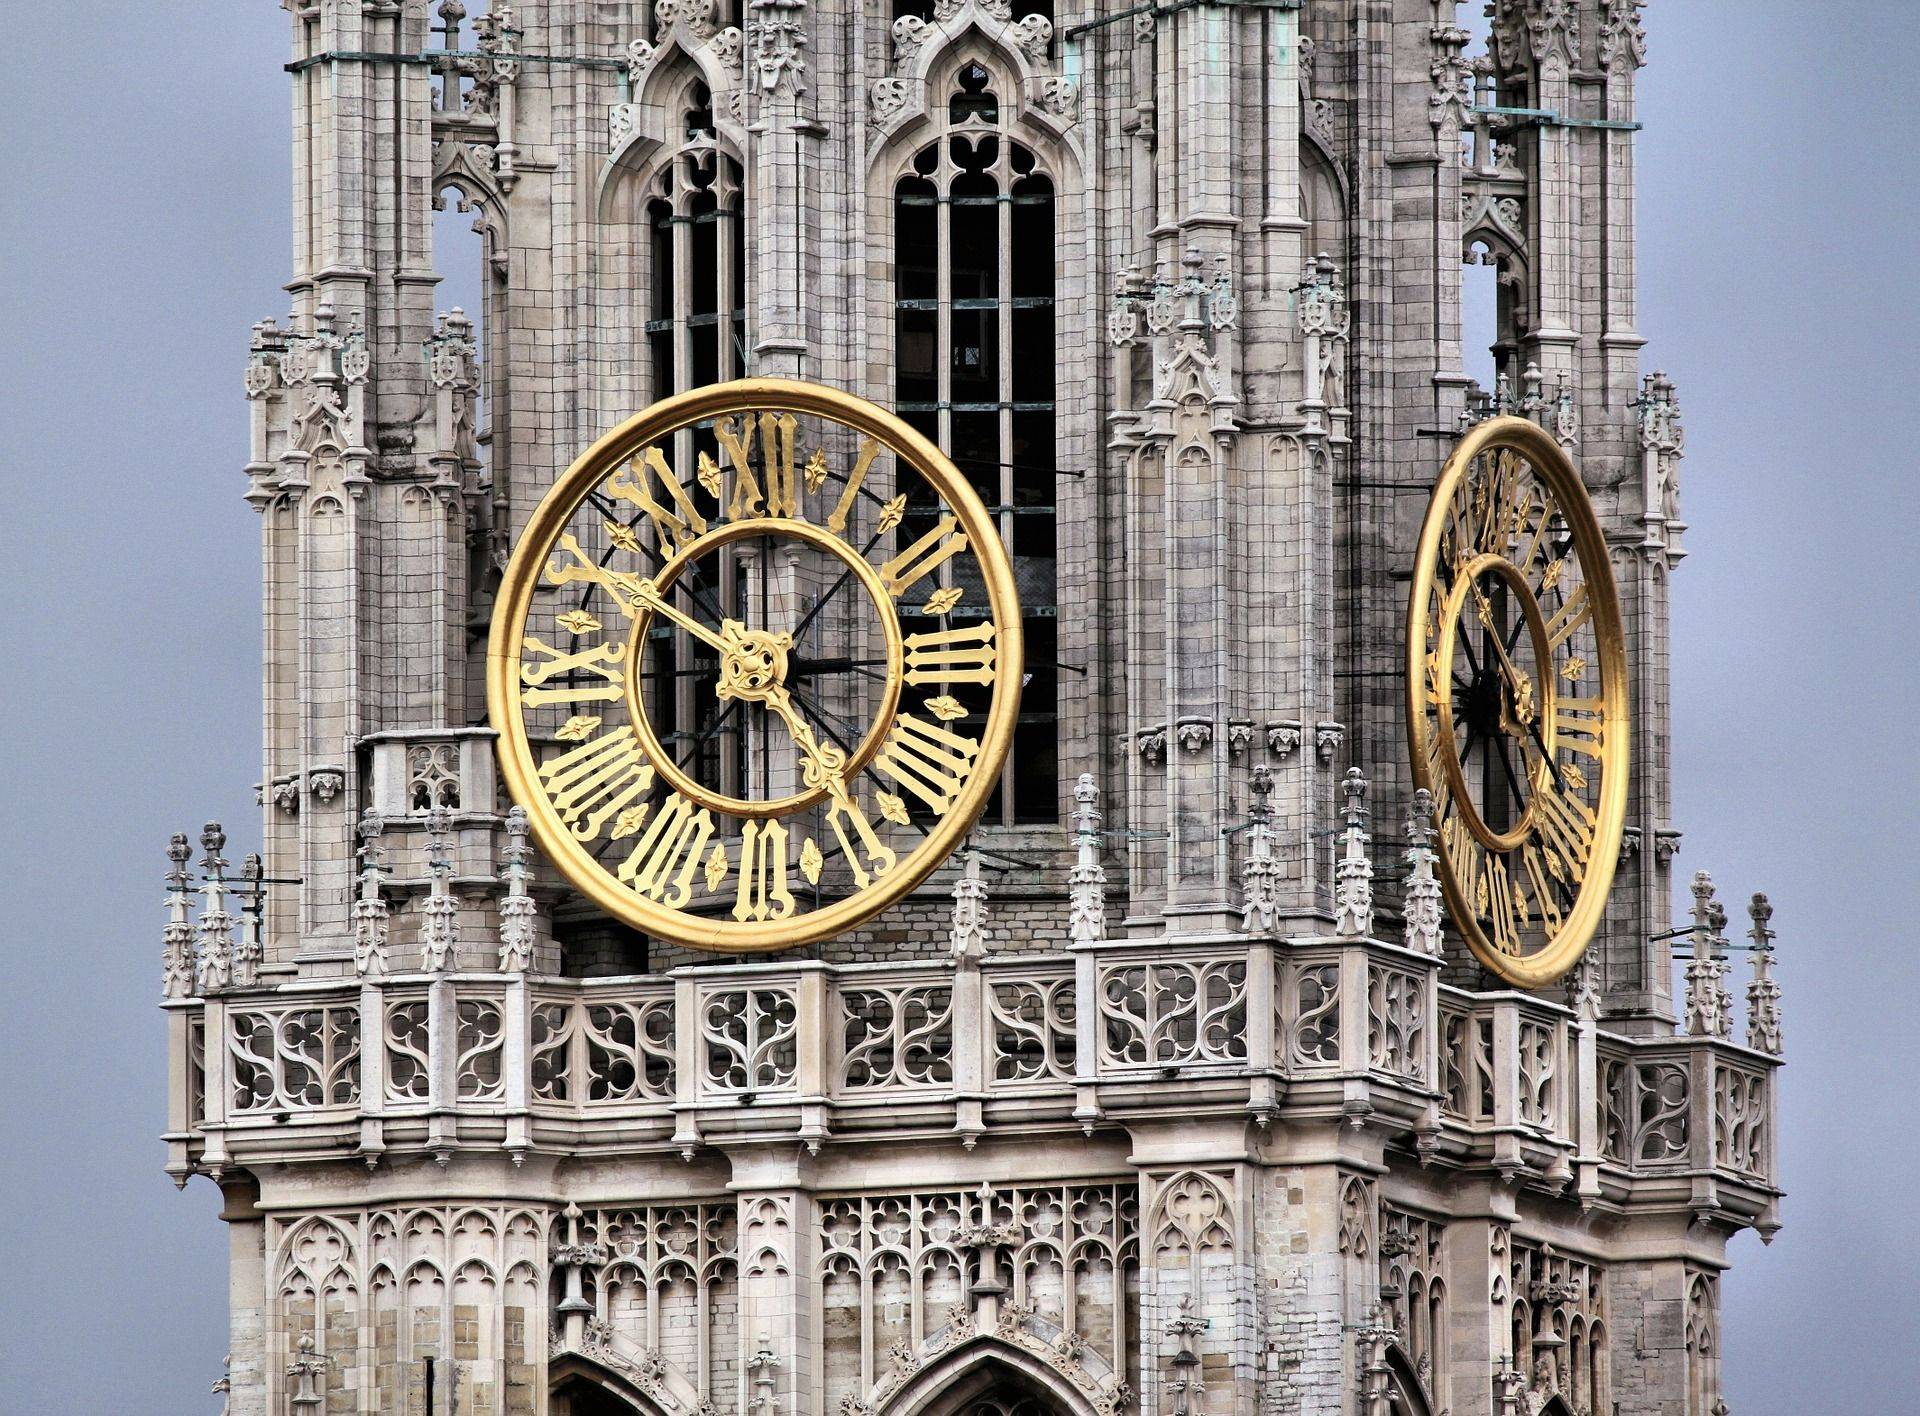 clock-tower-143224_1920.jpg (1920×1416)